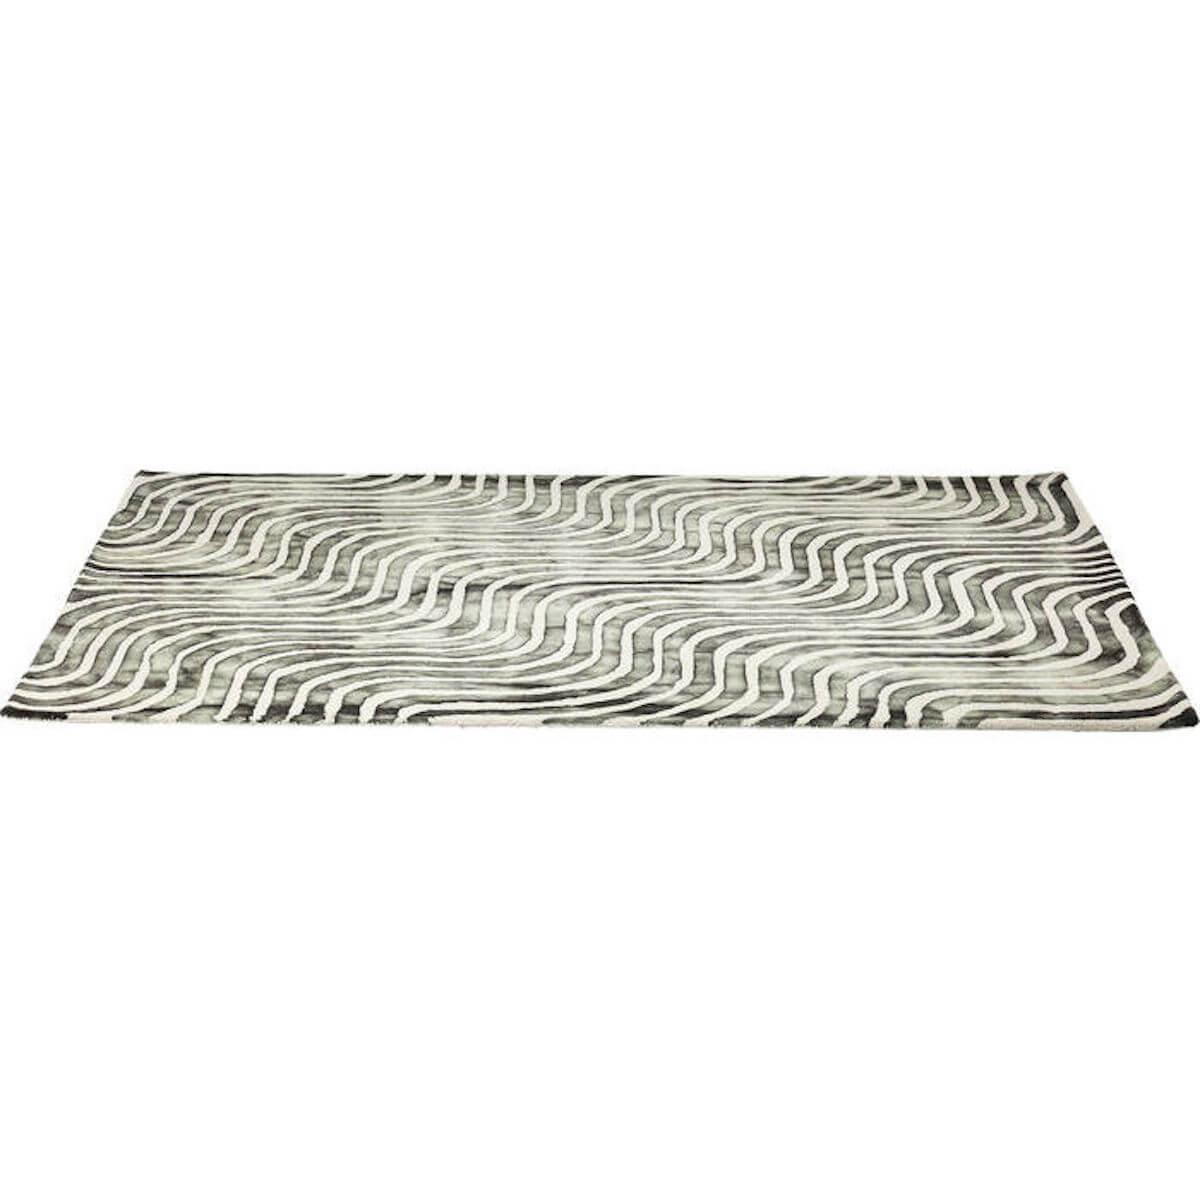 Tapis 170x240cm LA OLA Kare Design gris